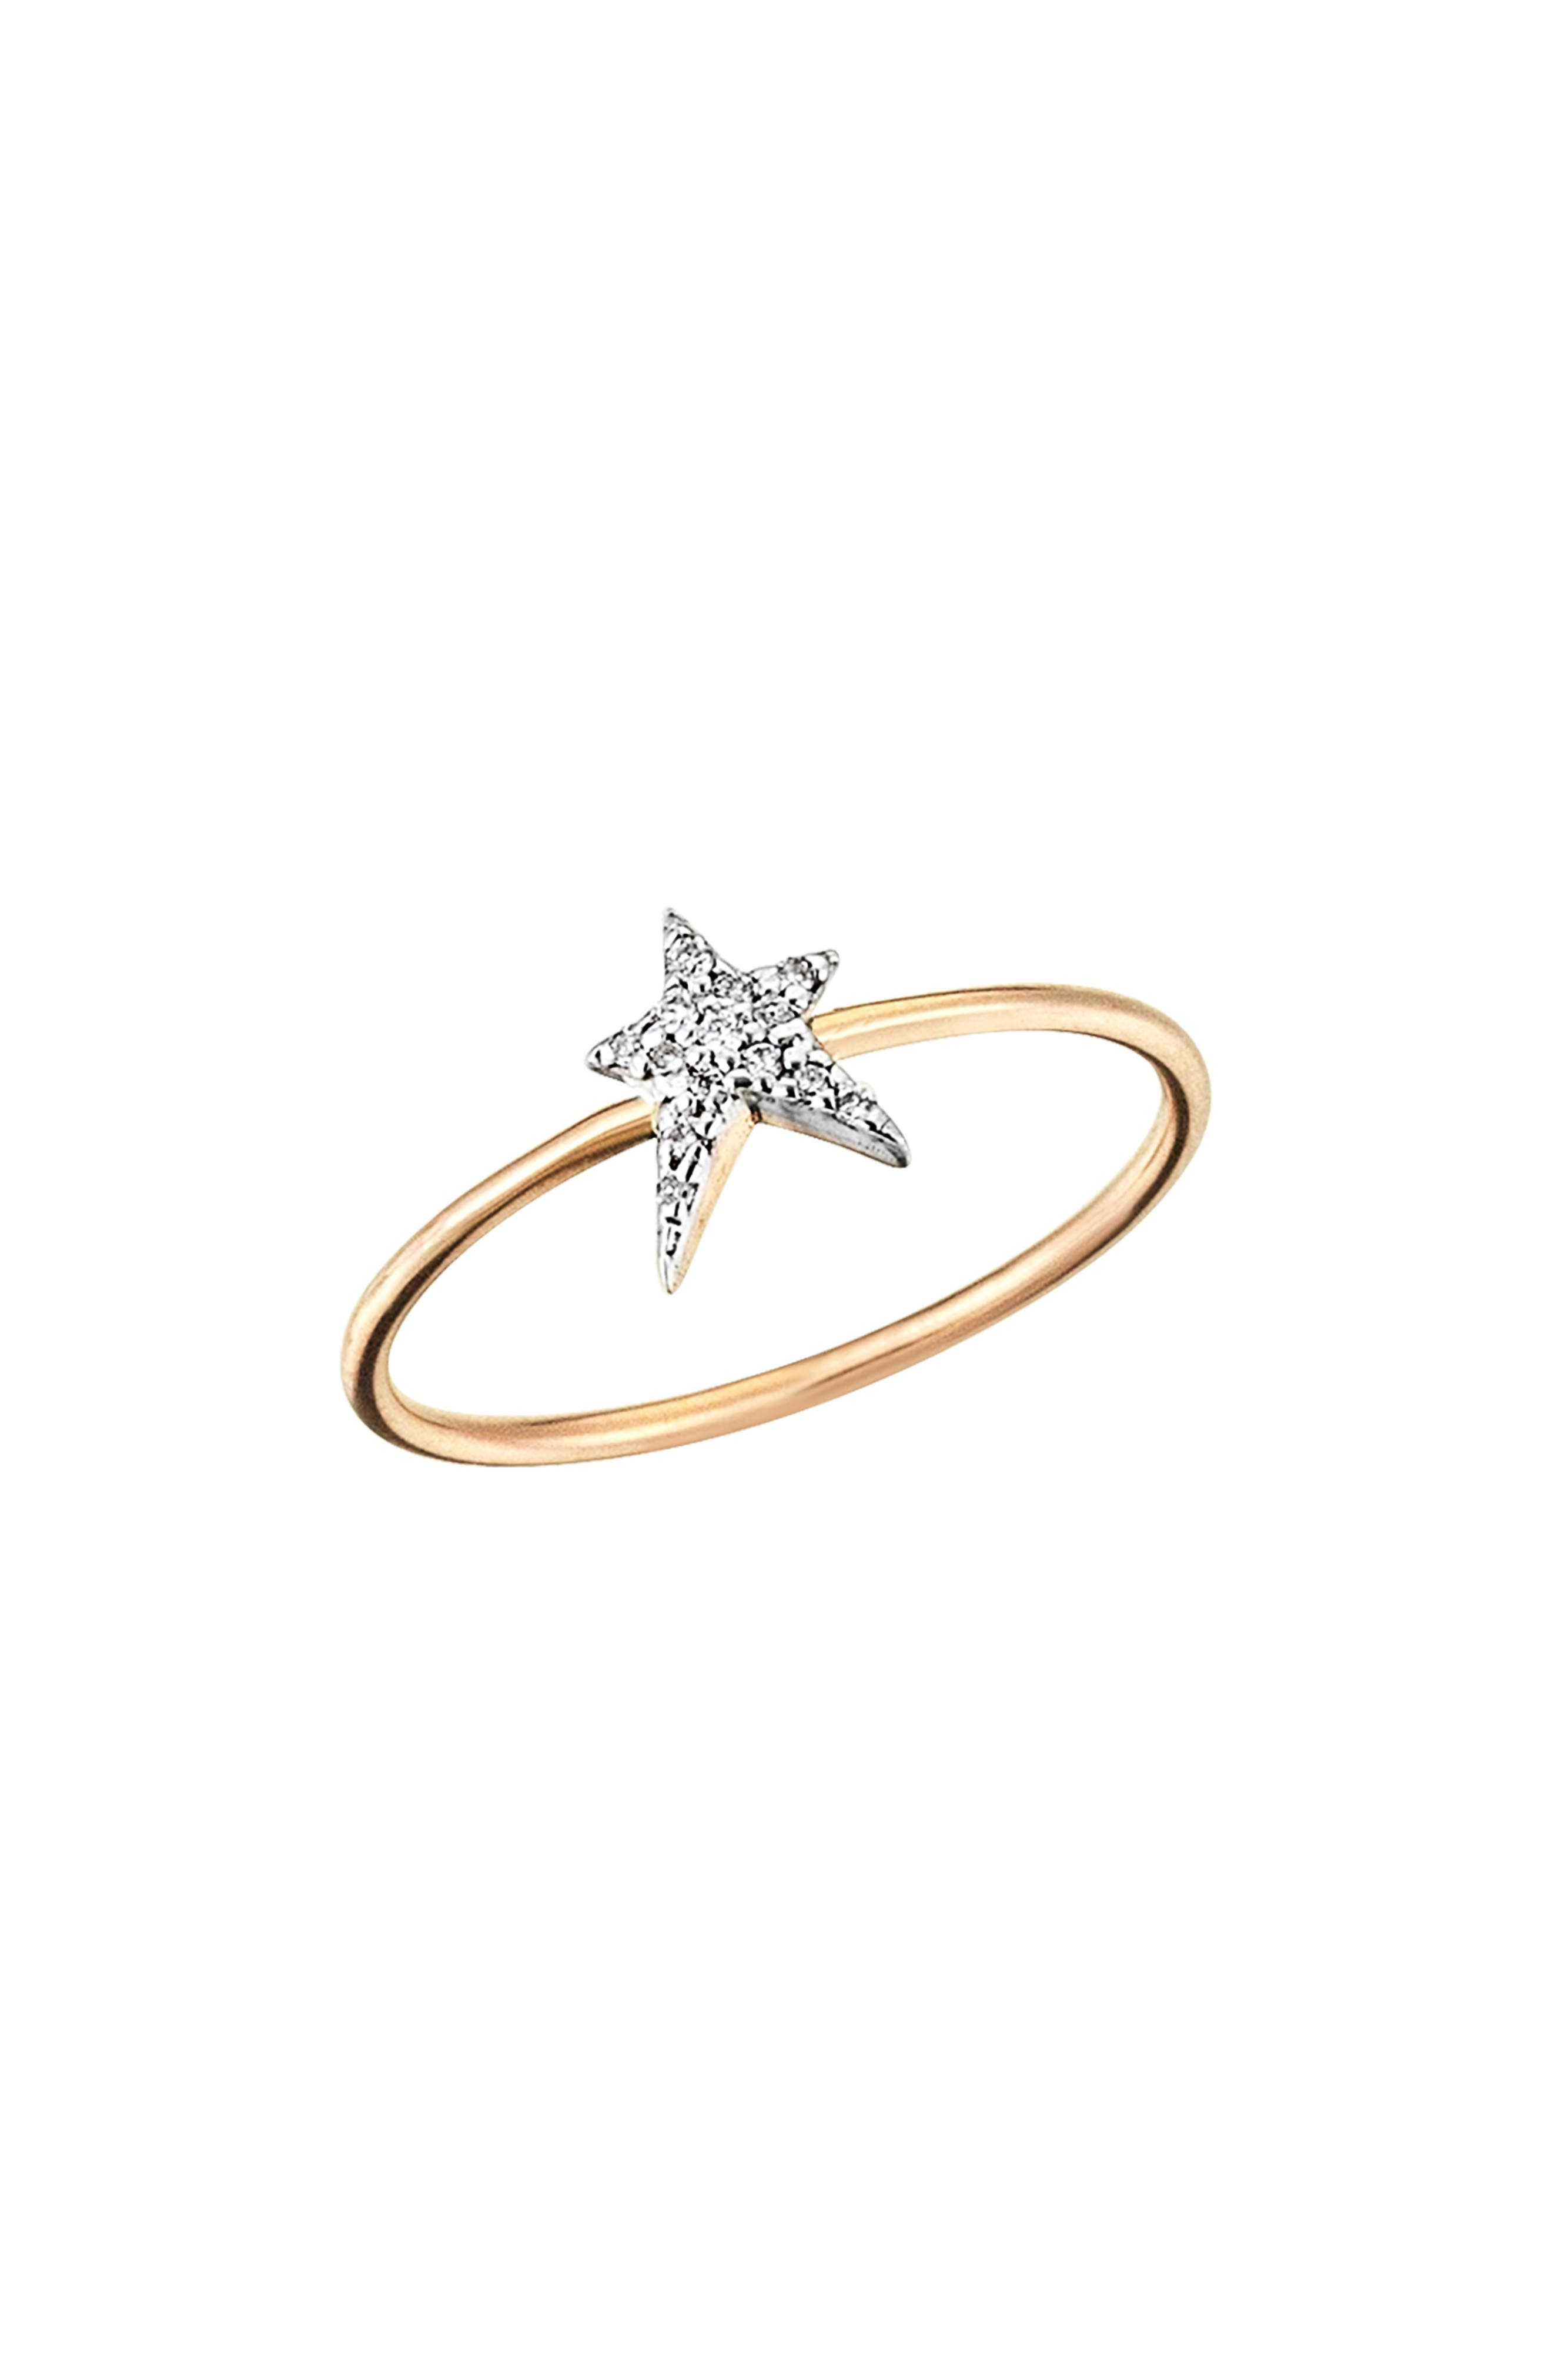 Main Image - Kismet by Milka Star Struck Diamond Ring